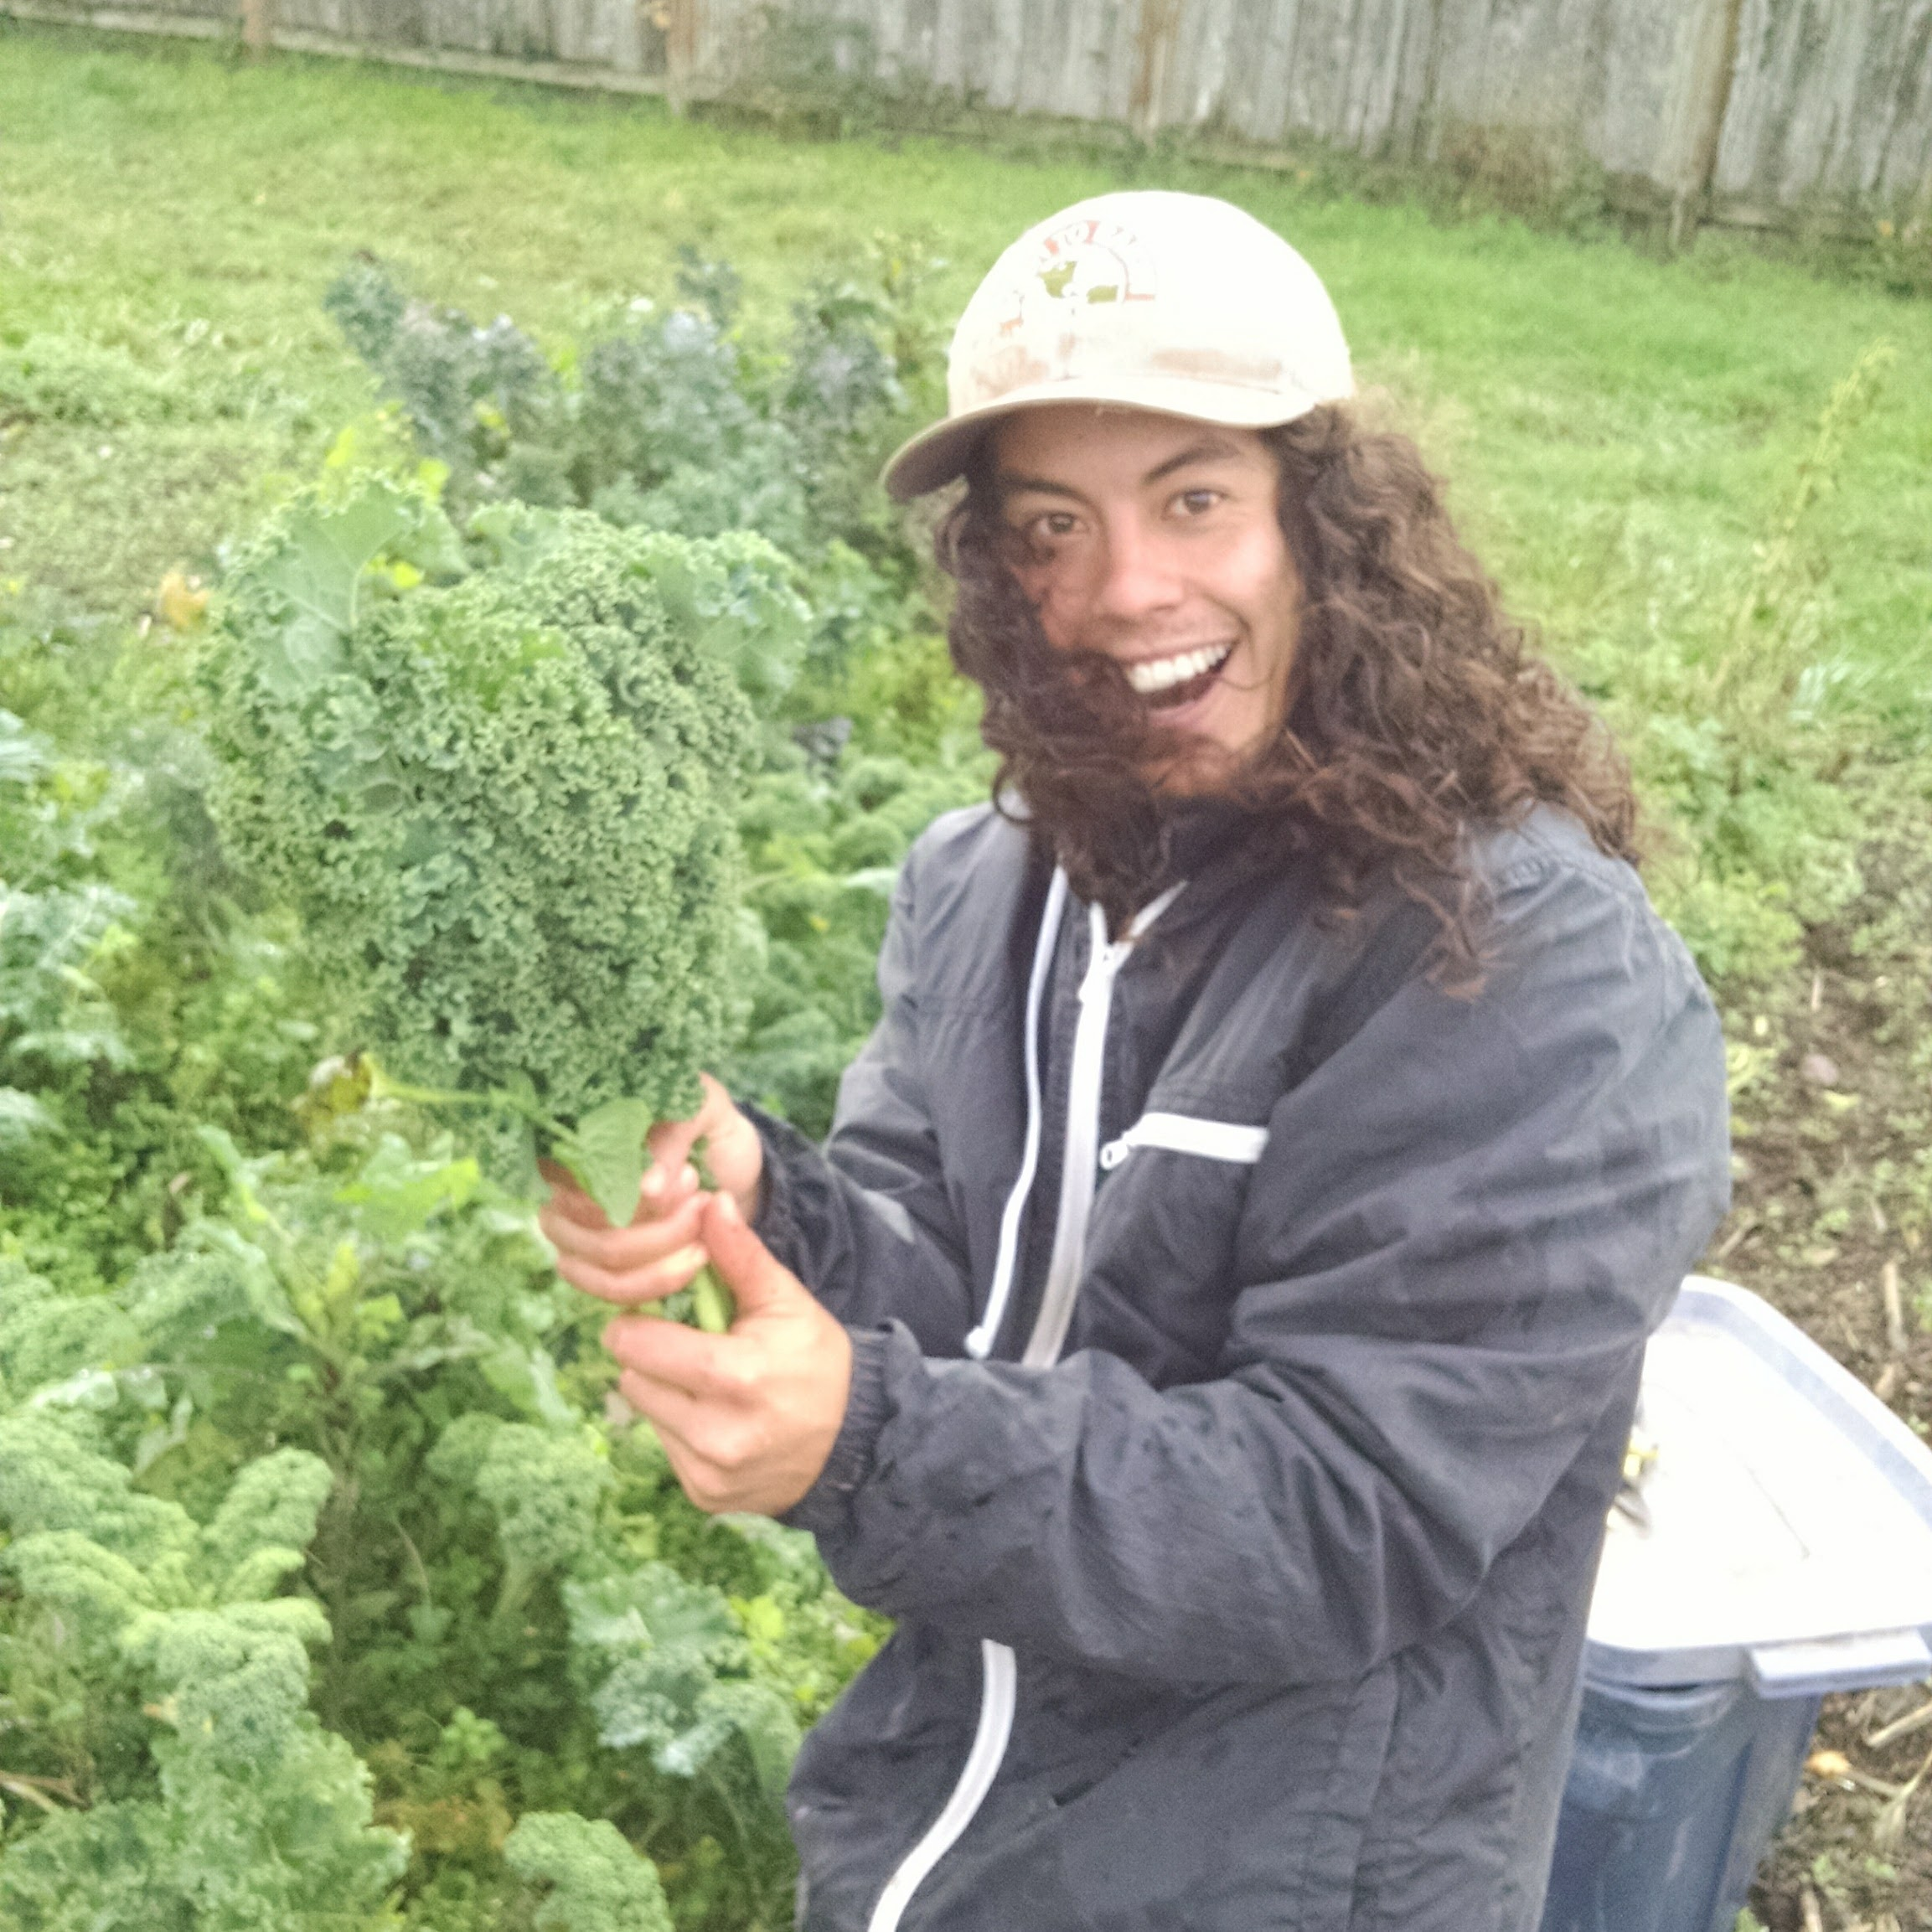 Michael harvesting kale last fall